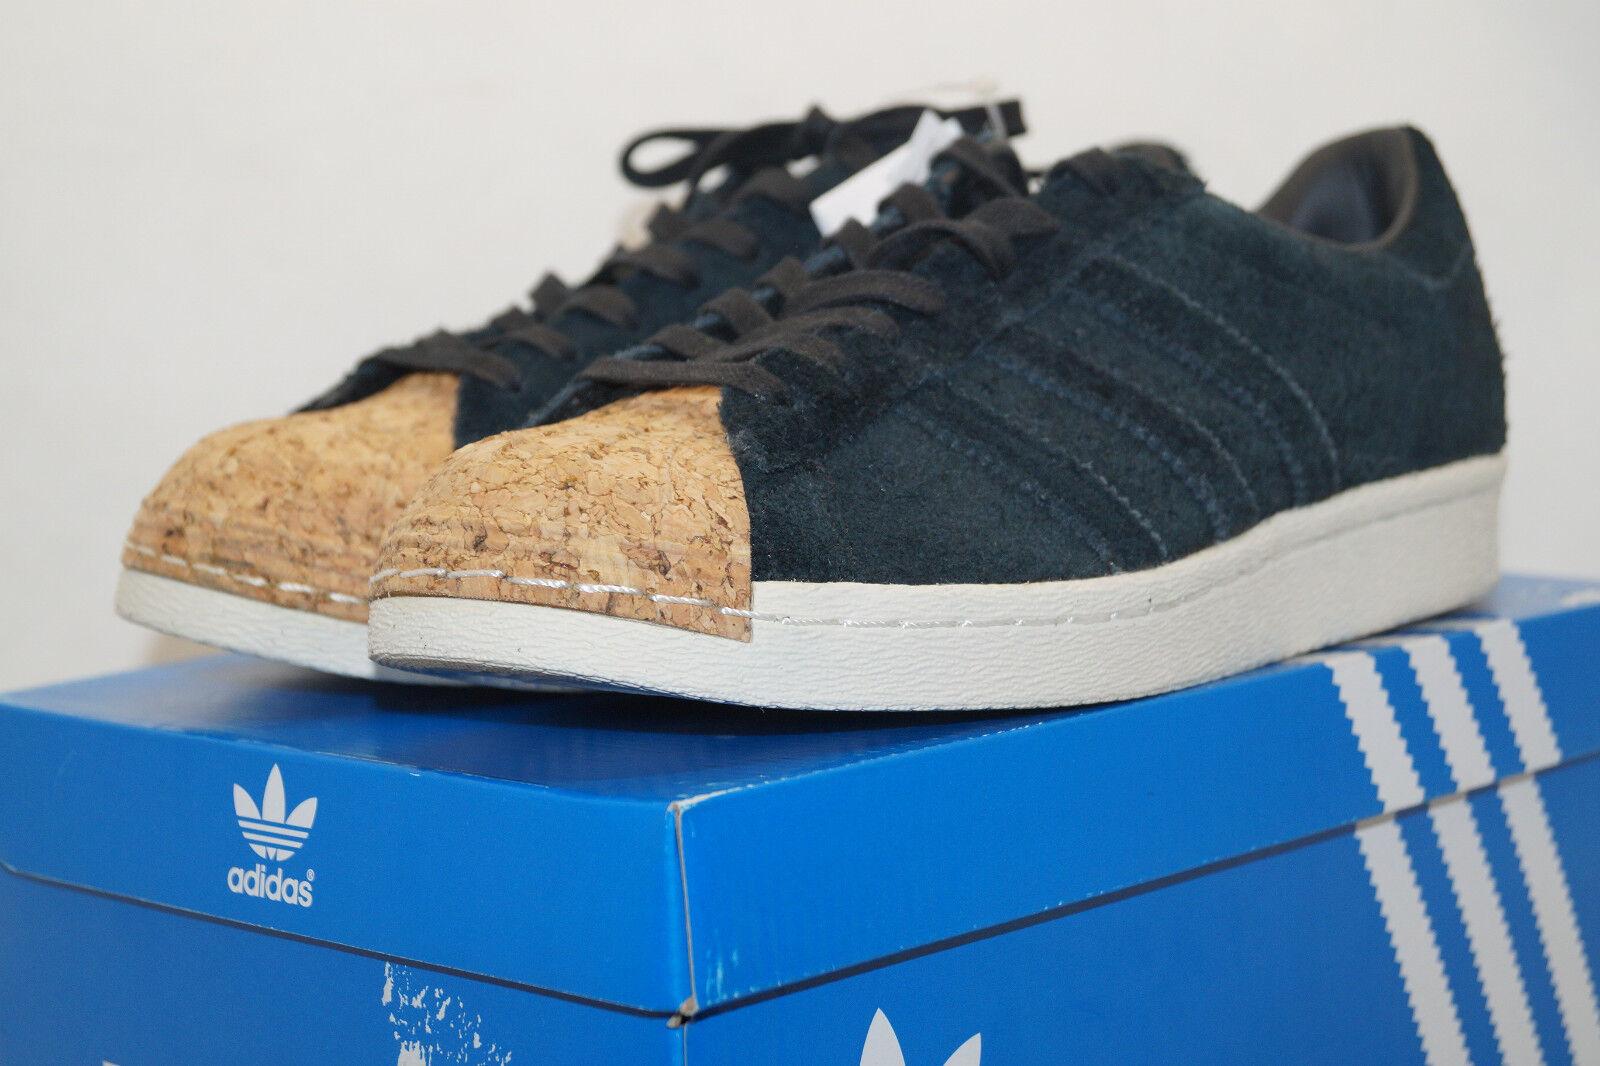 ADIDAS ORIGINALS superstar 80s Cork eu.38.6 uk.5.5 Suede sneakers Suede uk.5.5 by2963 Black 38a5b4